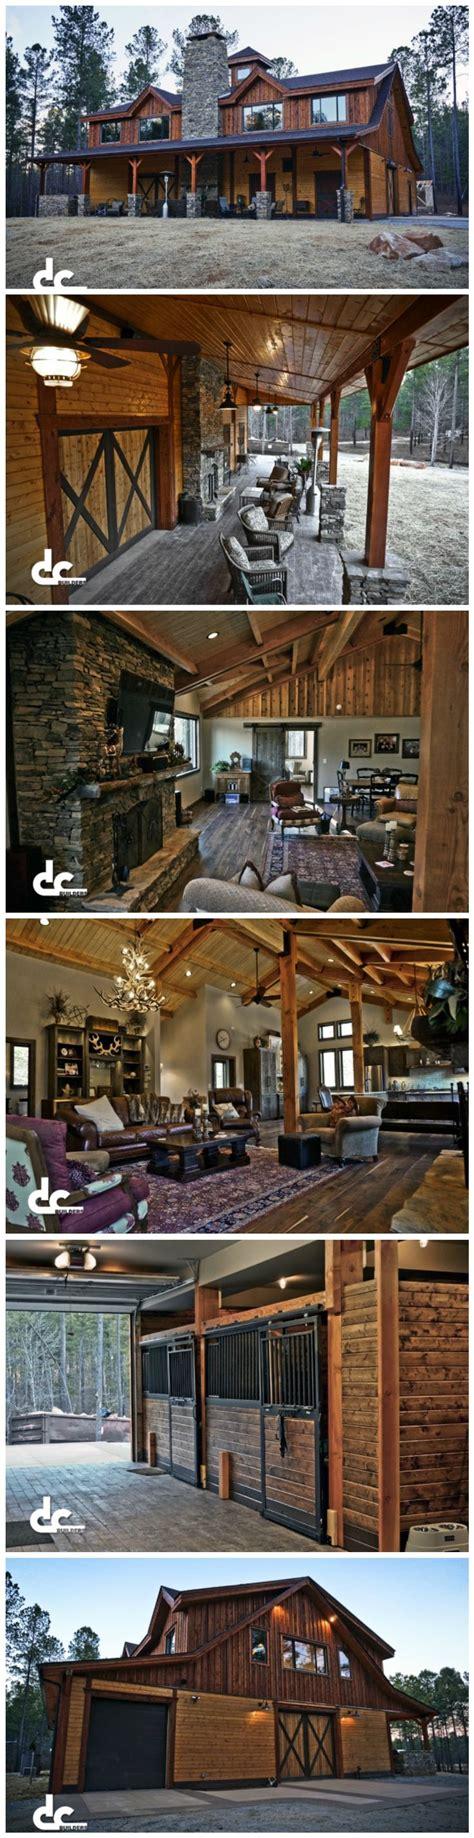 home living space design quarter best 25 garage with living quarters ideas on detached garage plans carriage house